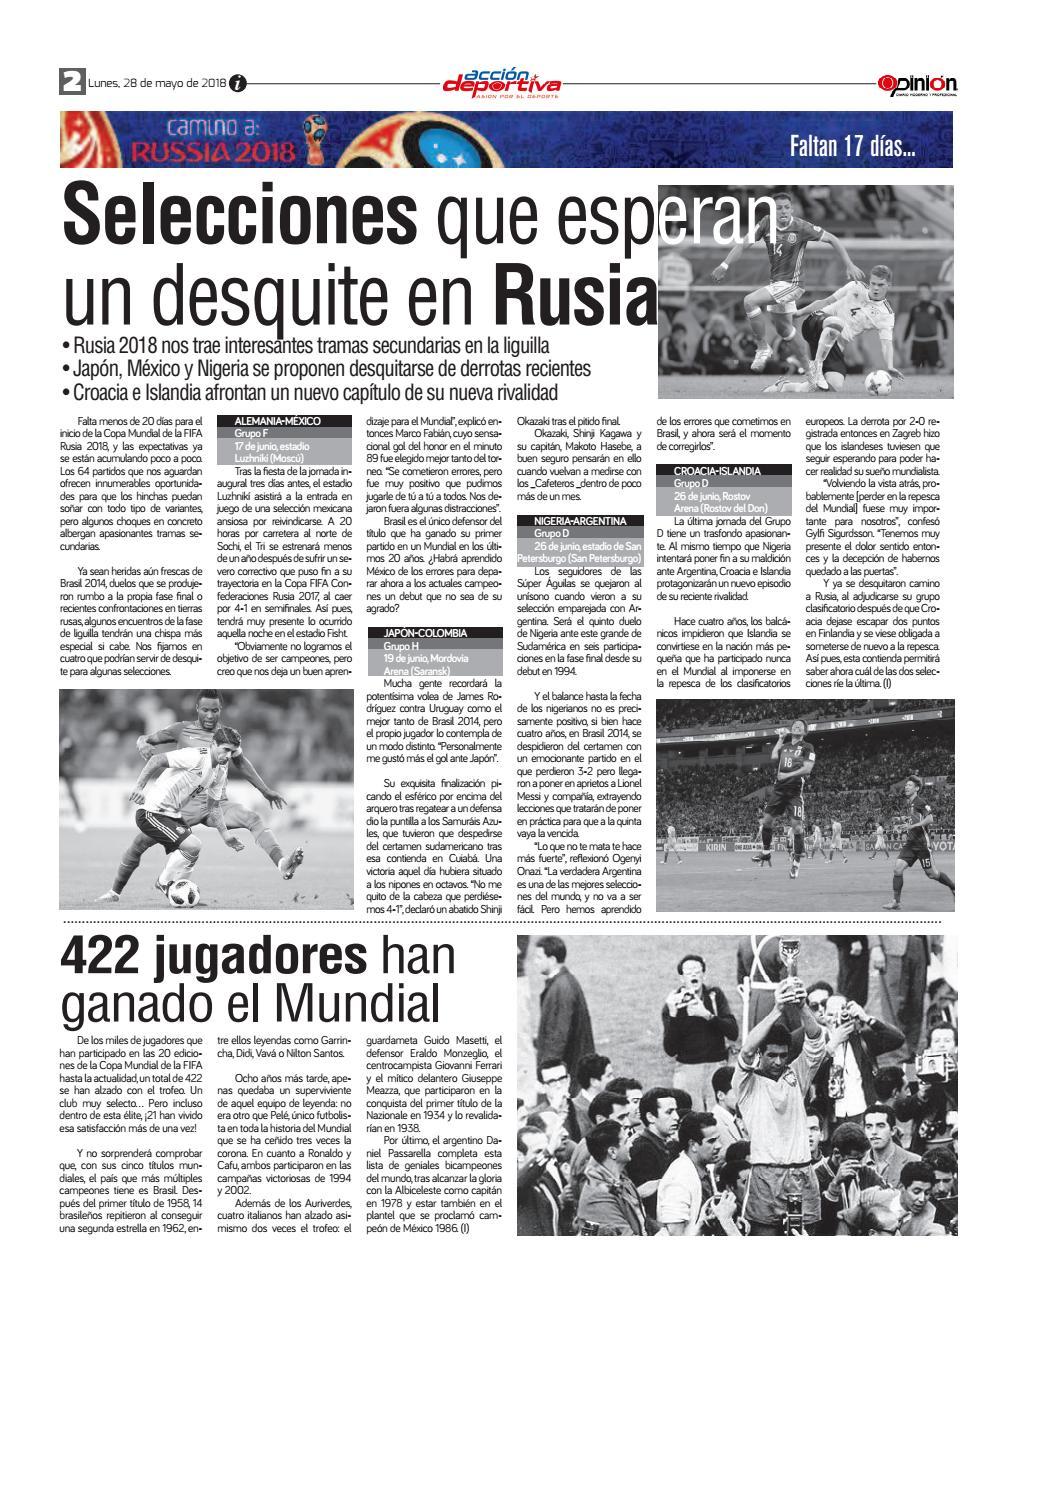 Impreso 28 04 18 by Diario Opinion - issuu